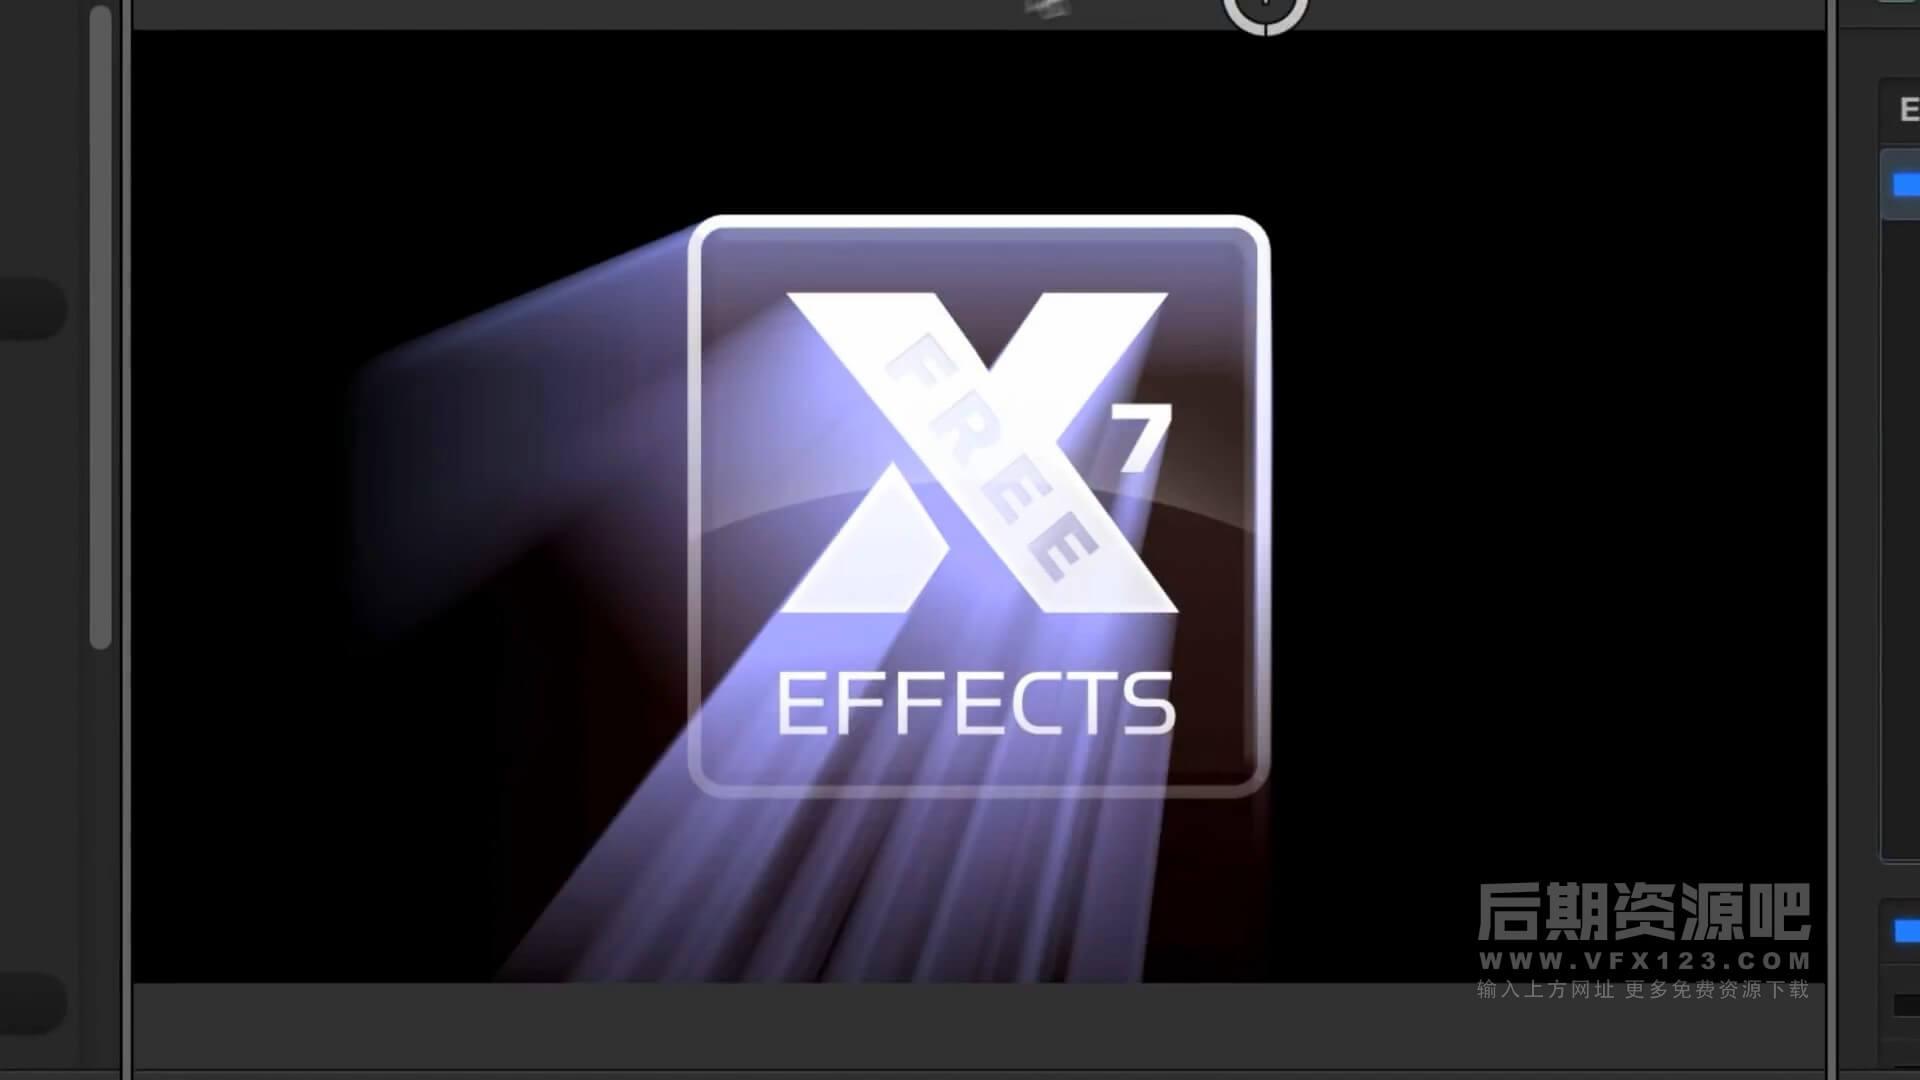 fcpx特效插件 图形图像添加彩色射线效果插件 COLOUR RAYS